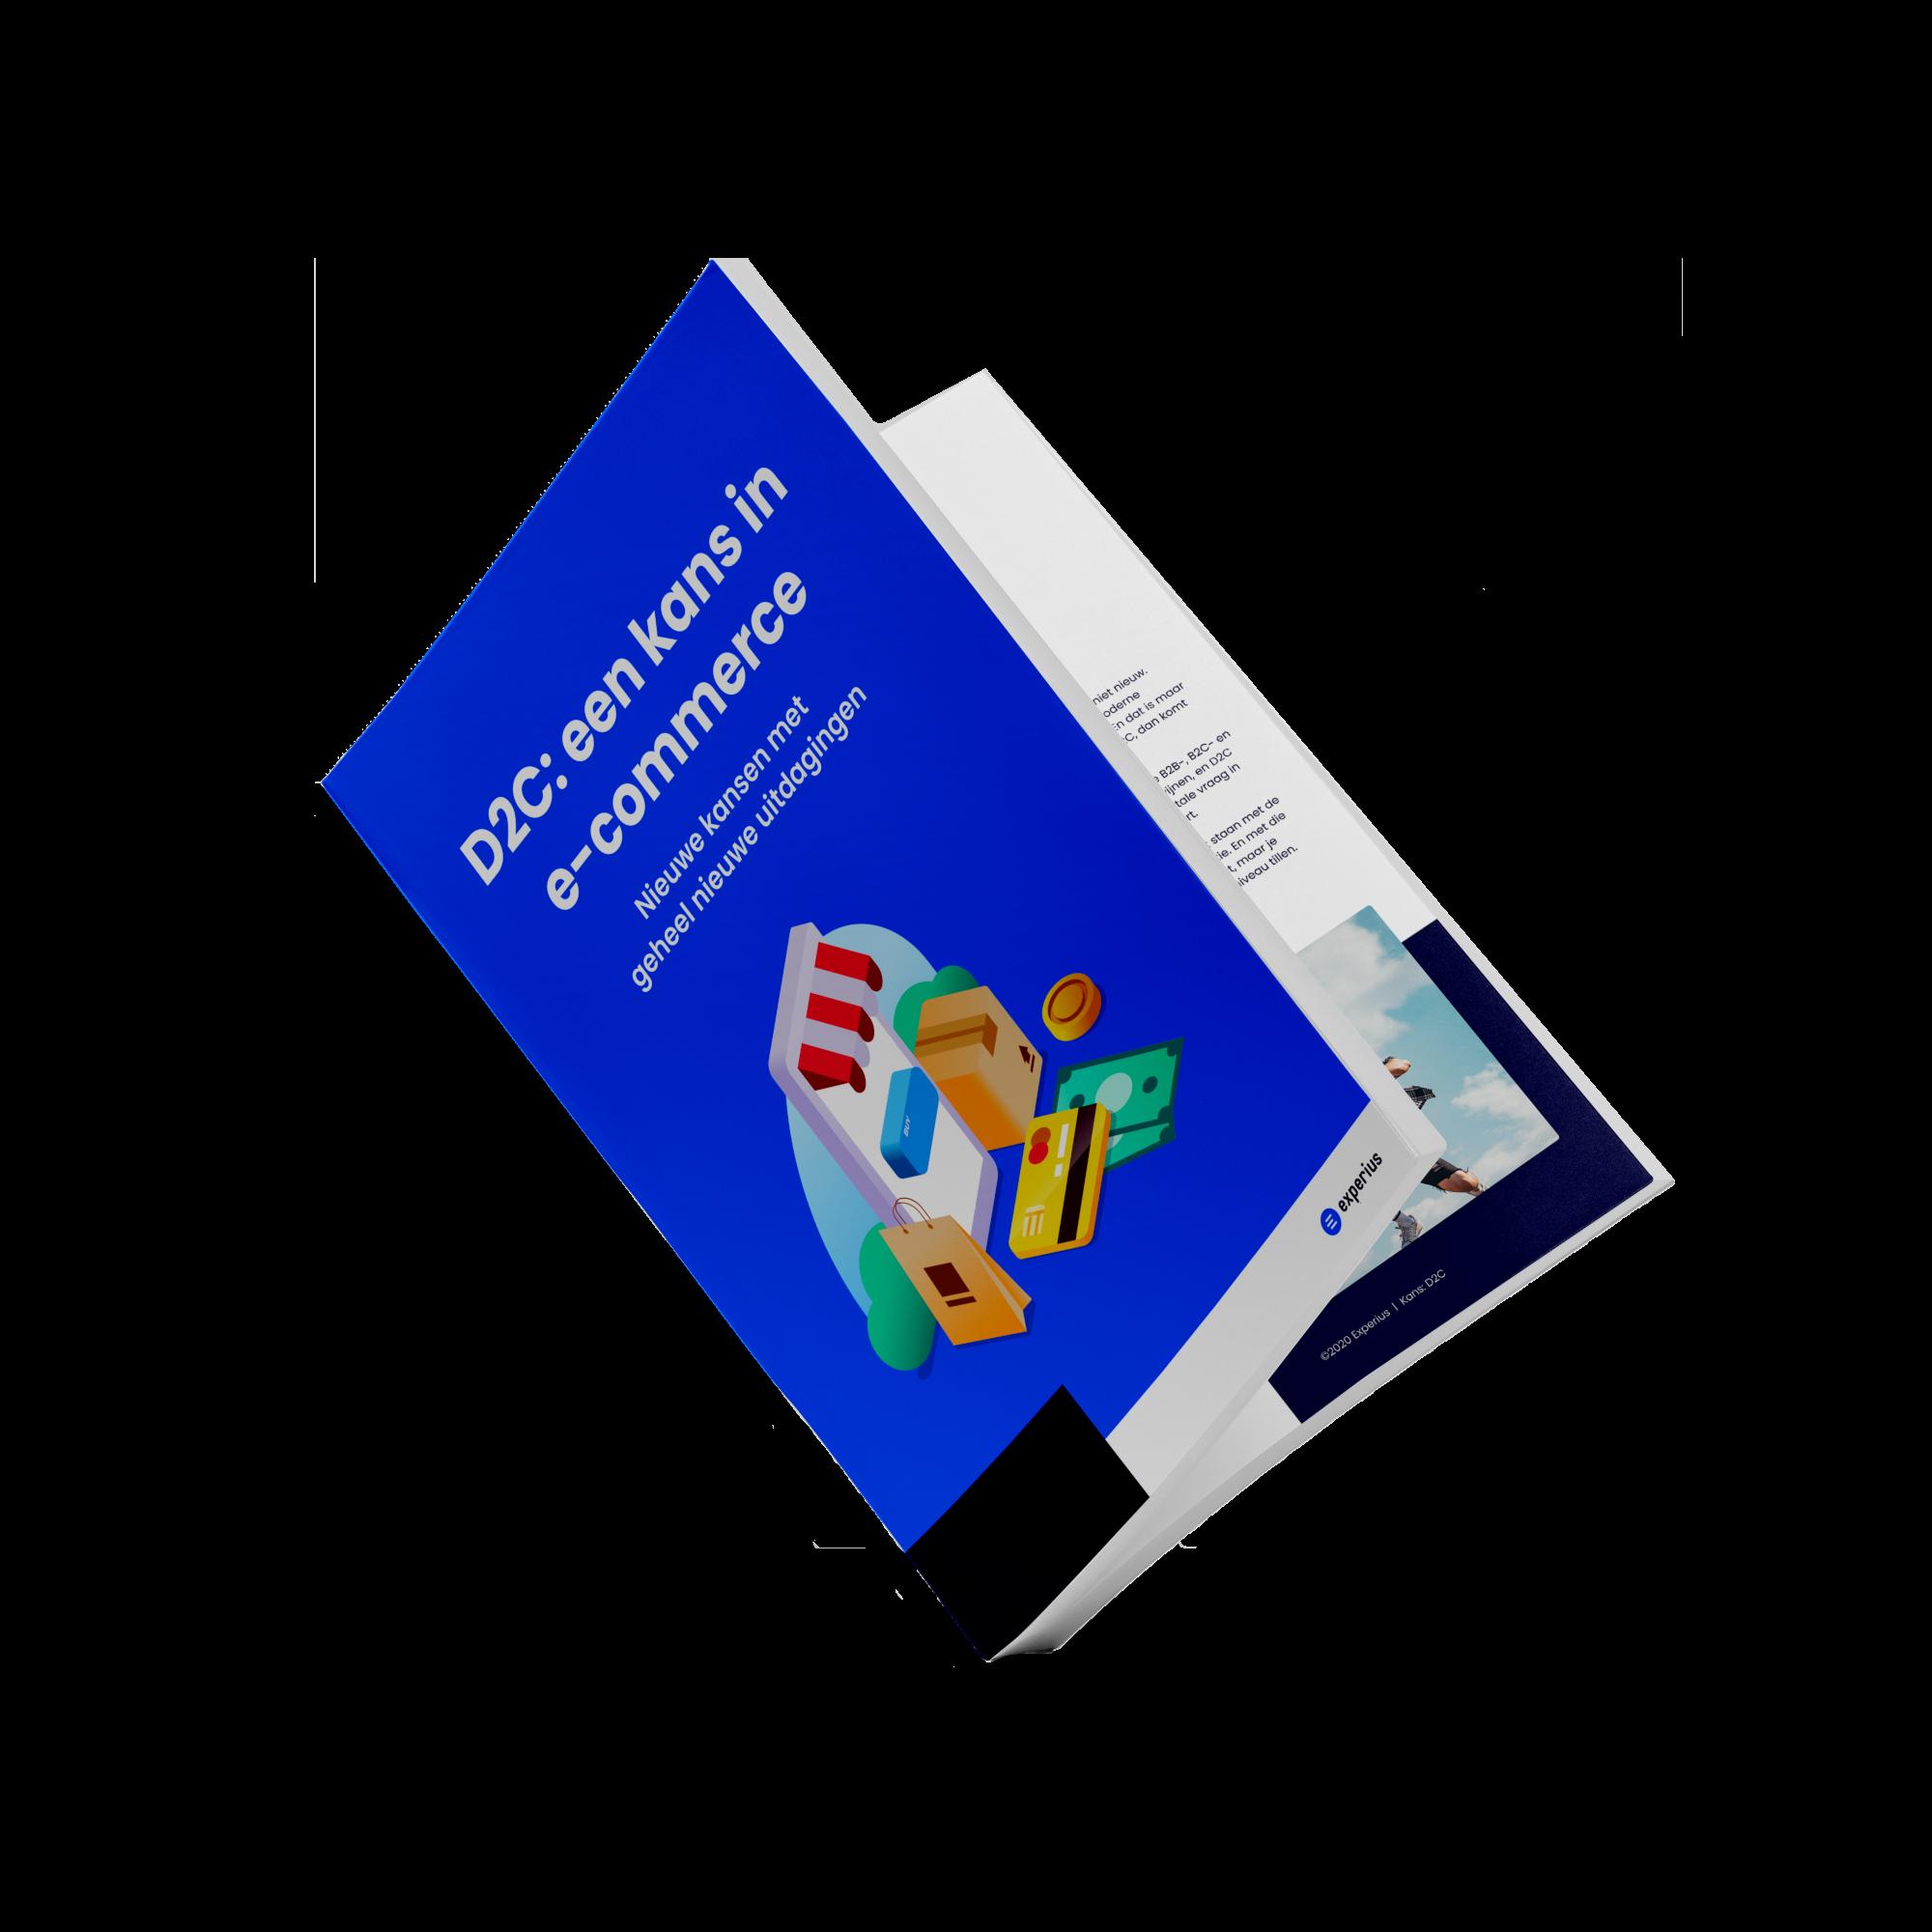 ebook_mockup_small2